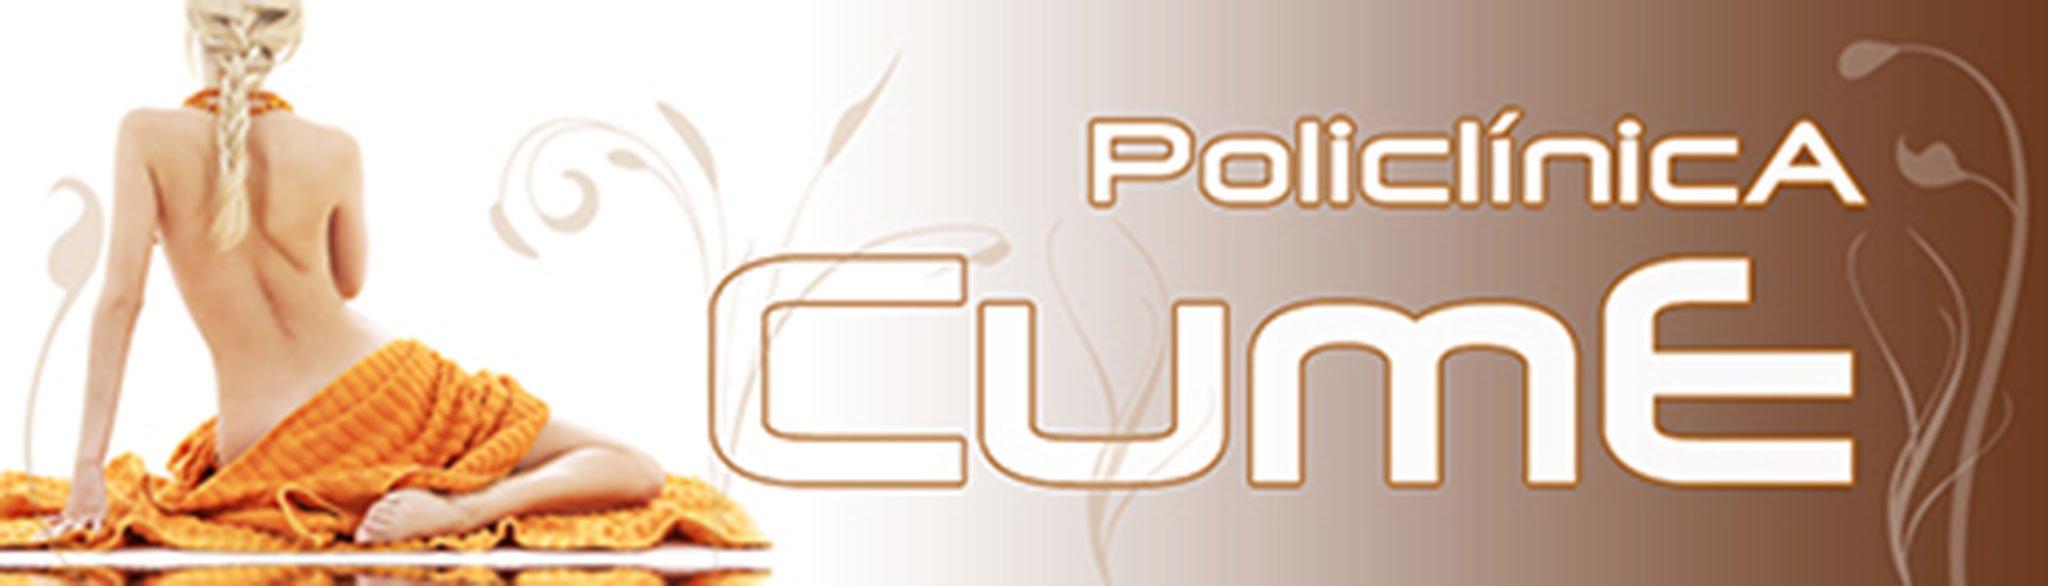 CUME Polyclinic logo